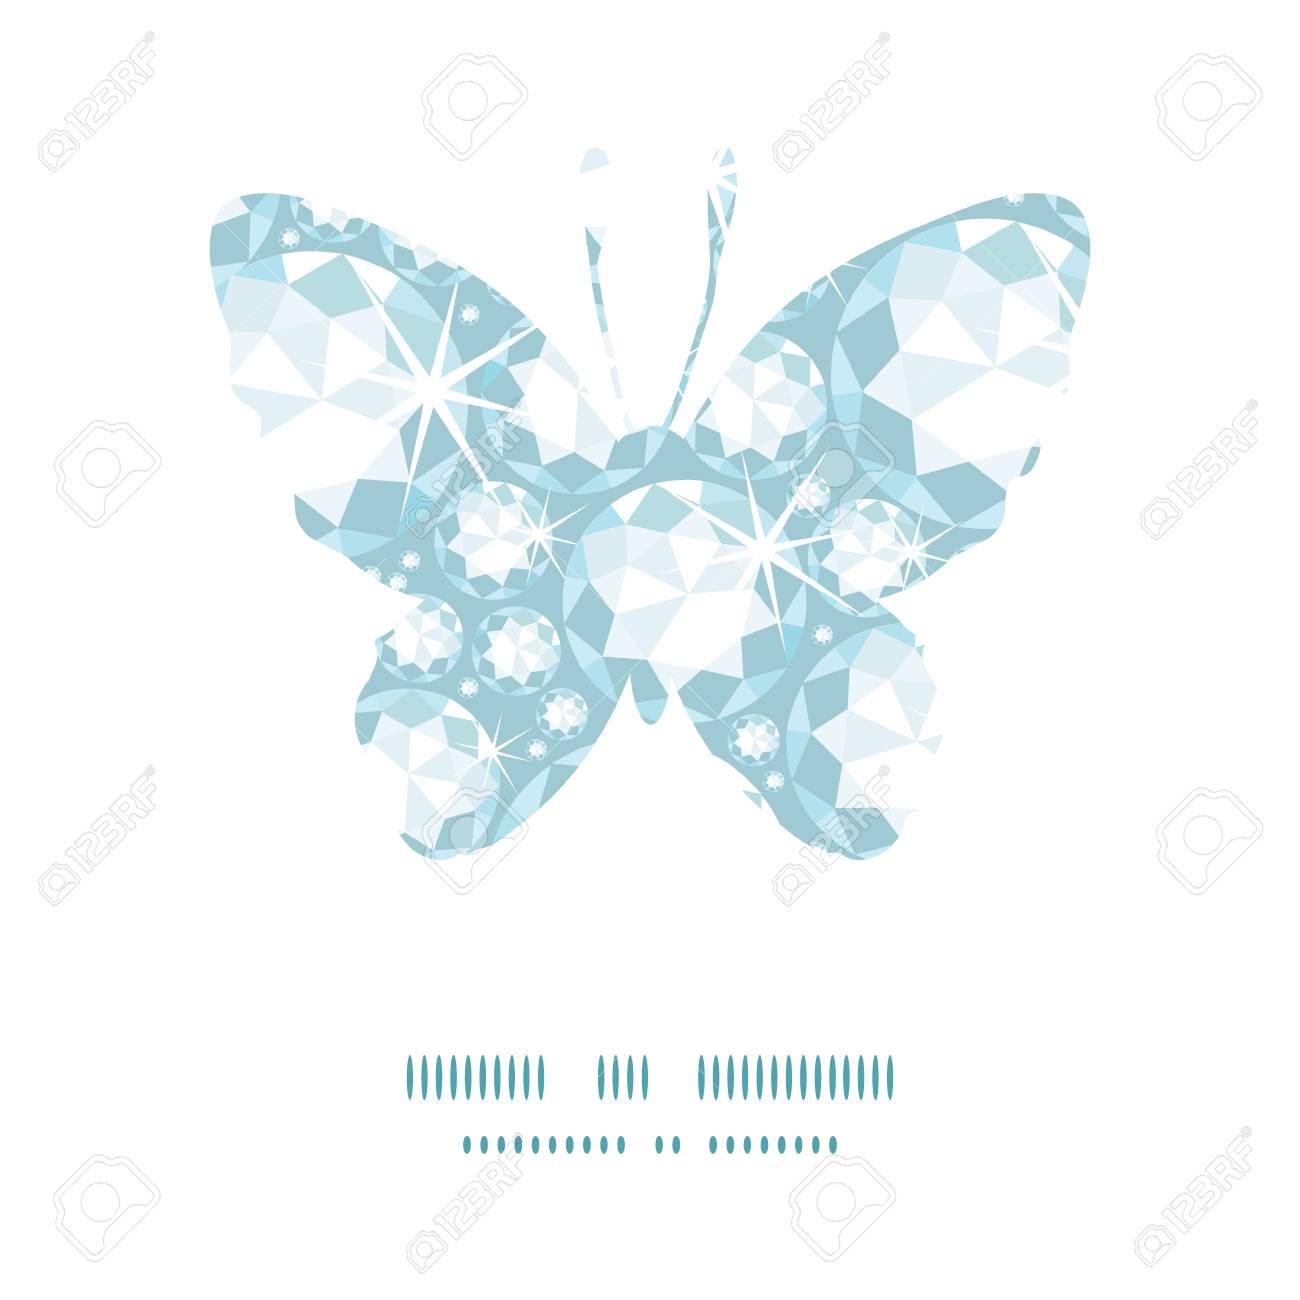 Vector Glänzende Diamanten Schmetterling Silhouette Muster Rahmen ...